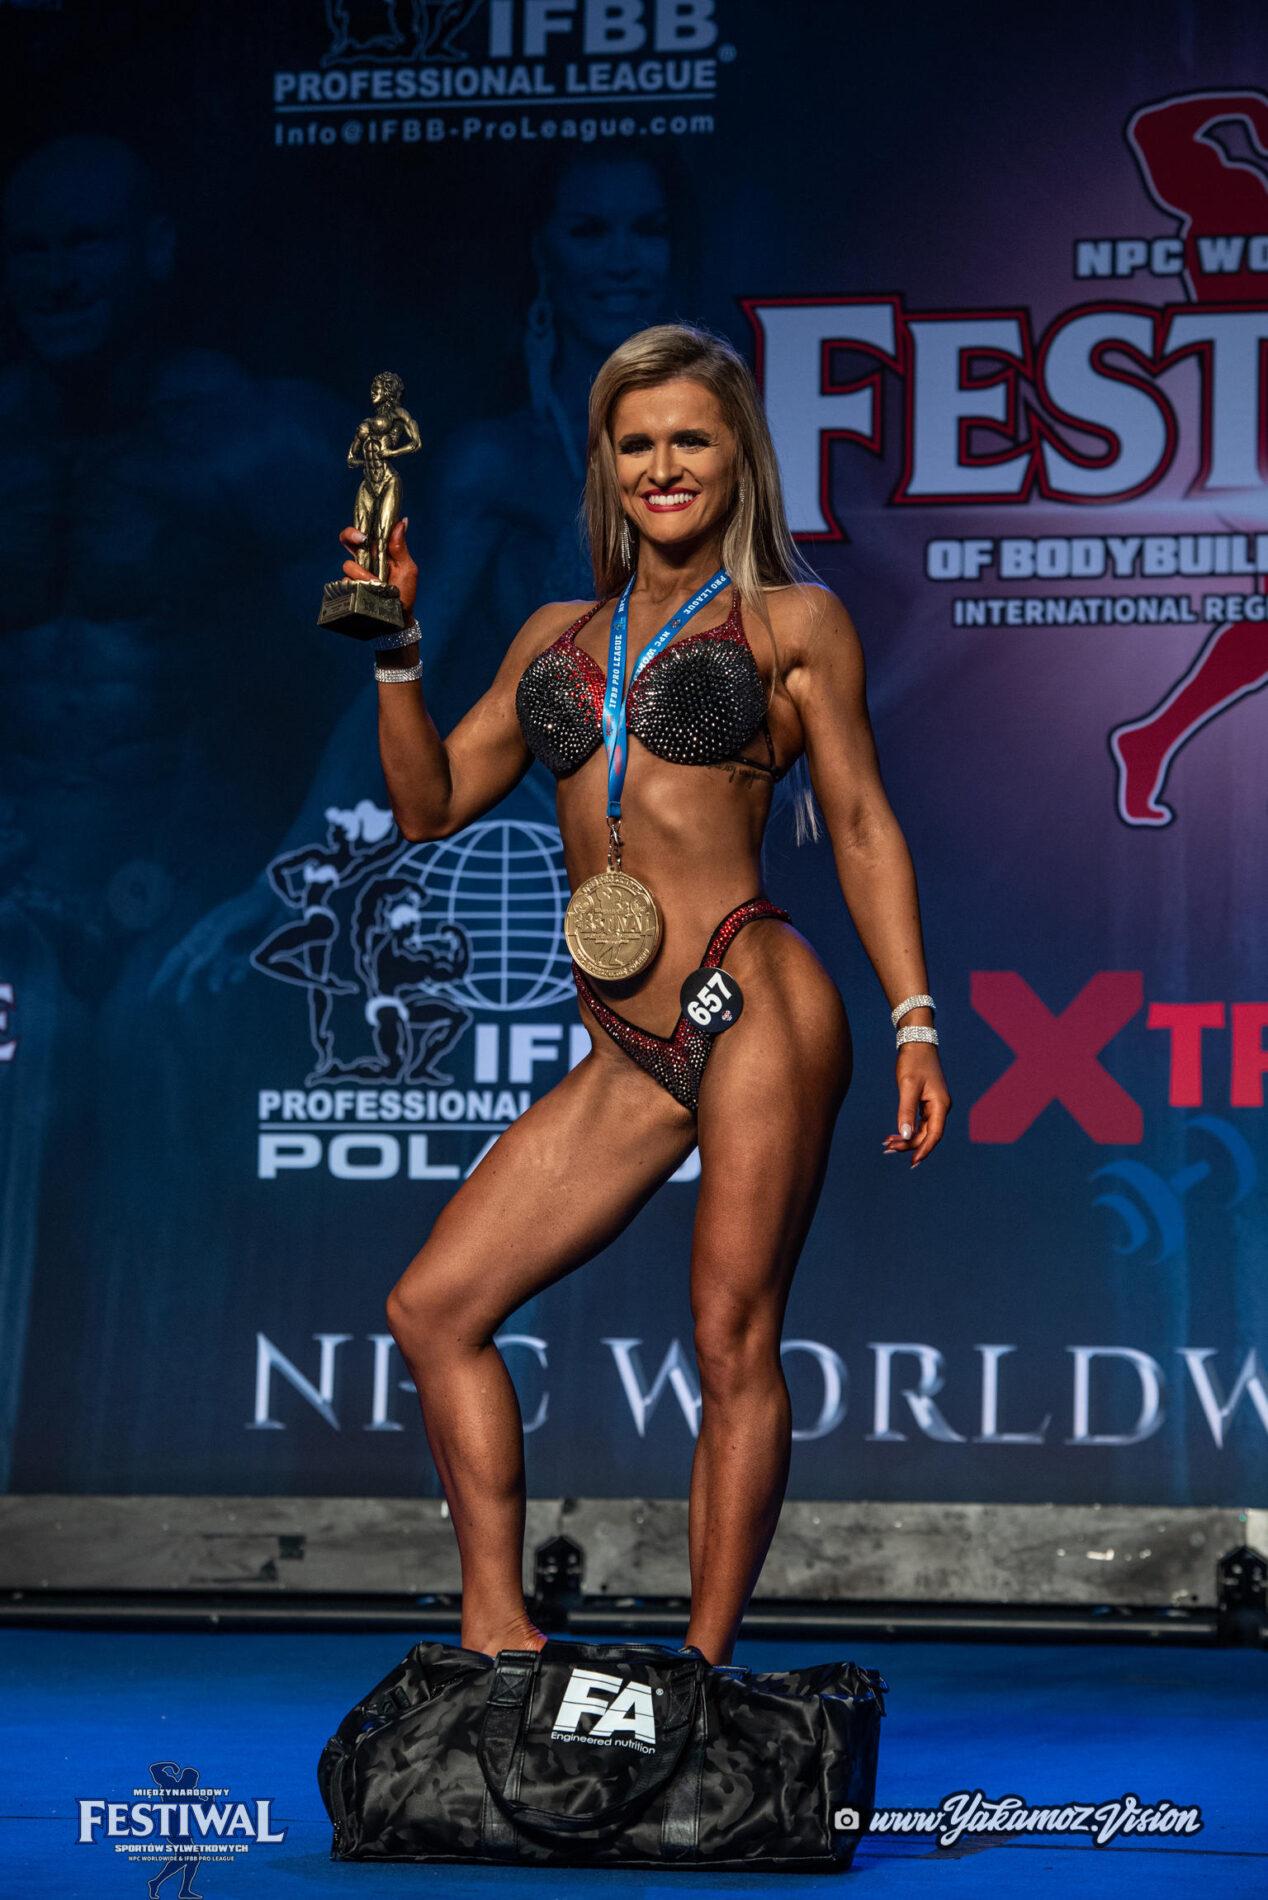 Amanda Gadecka